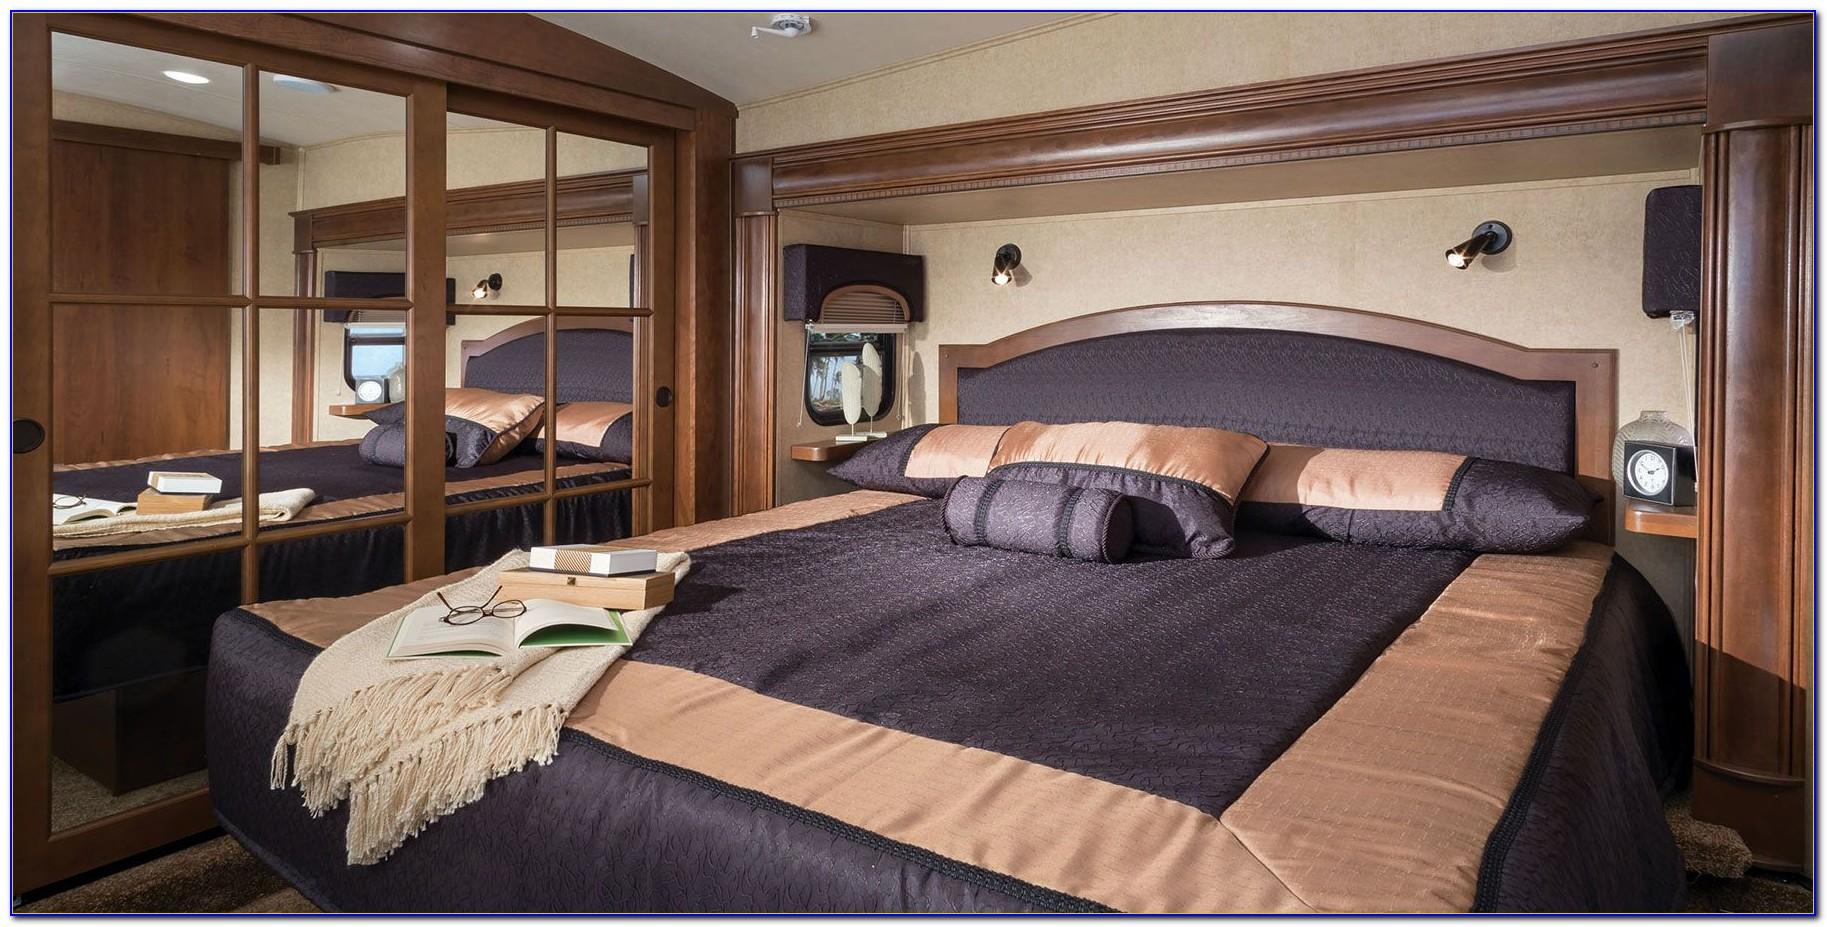 2 Bedroom 5th Wheel Camper